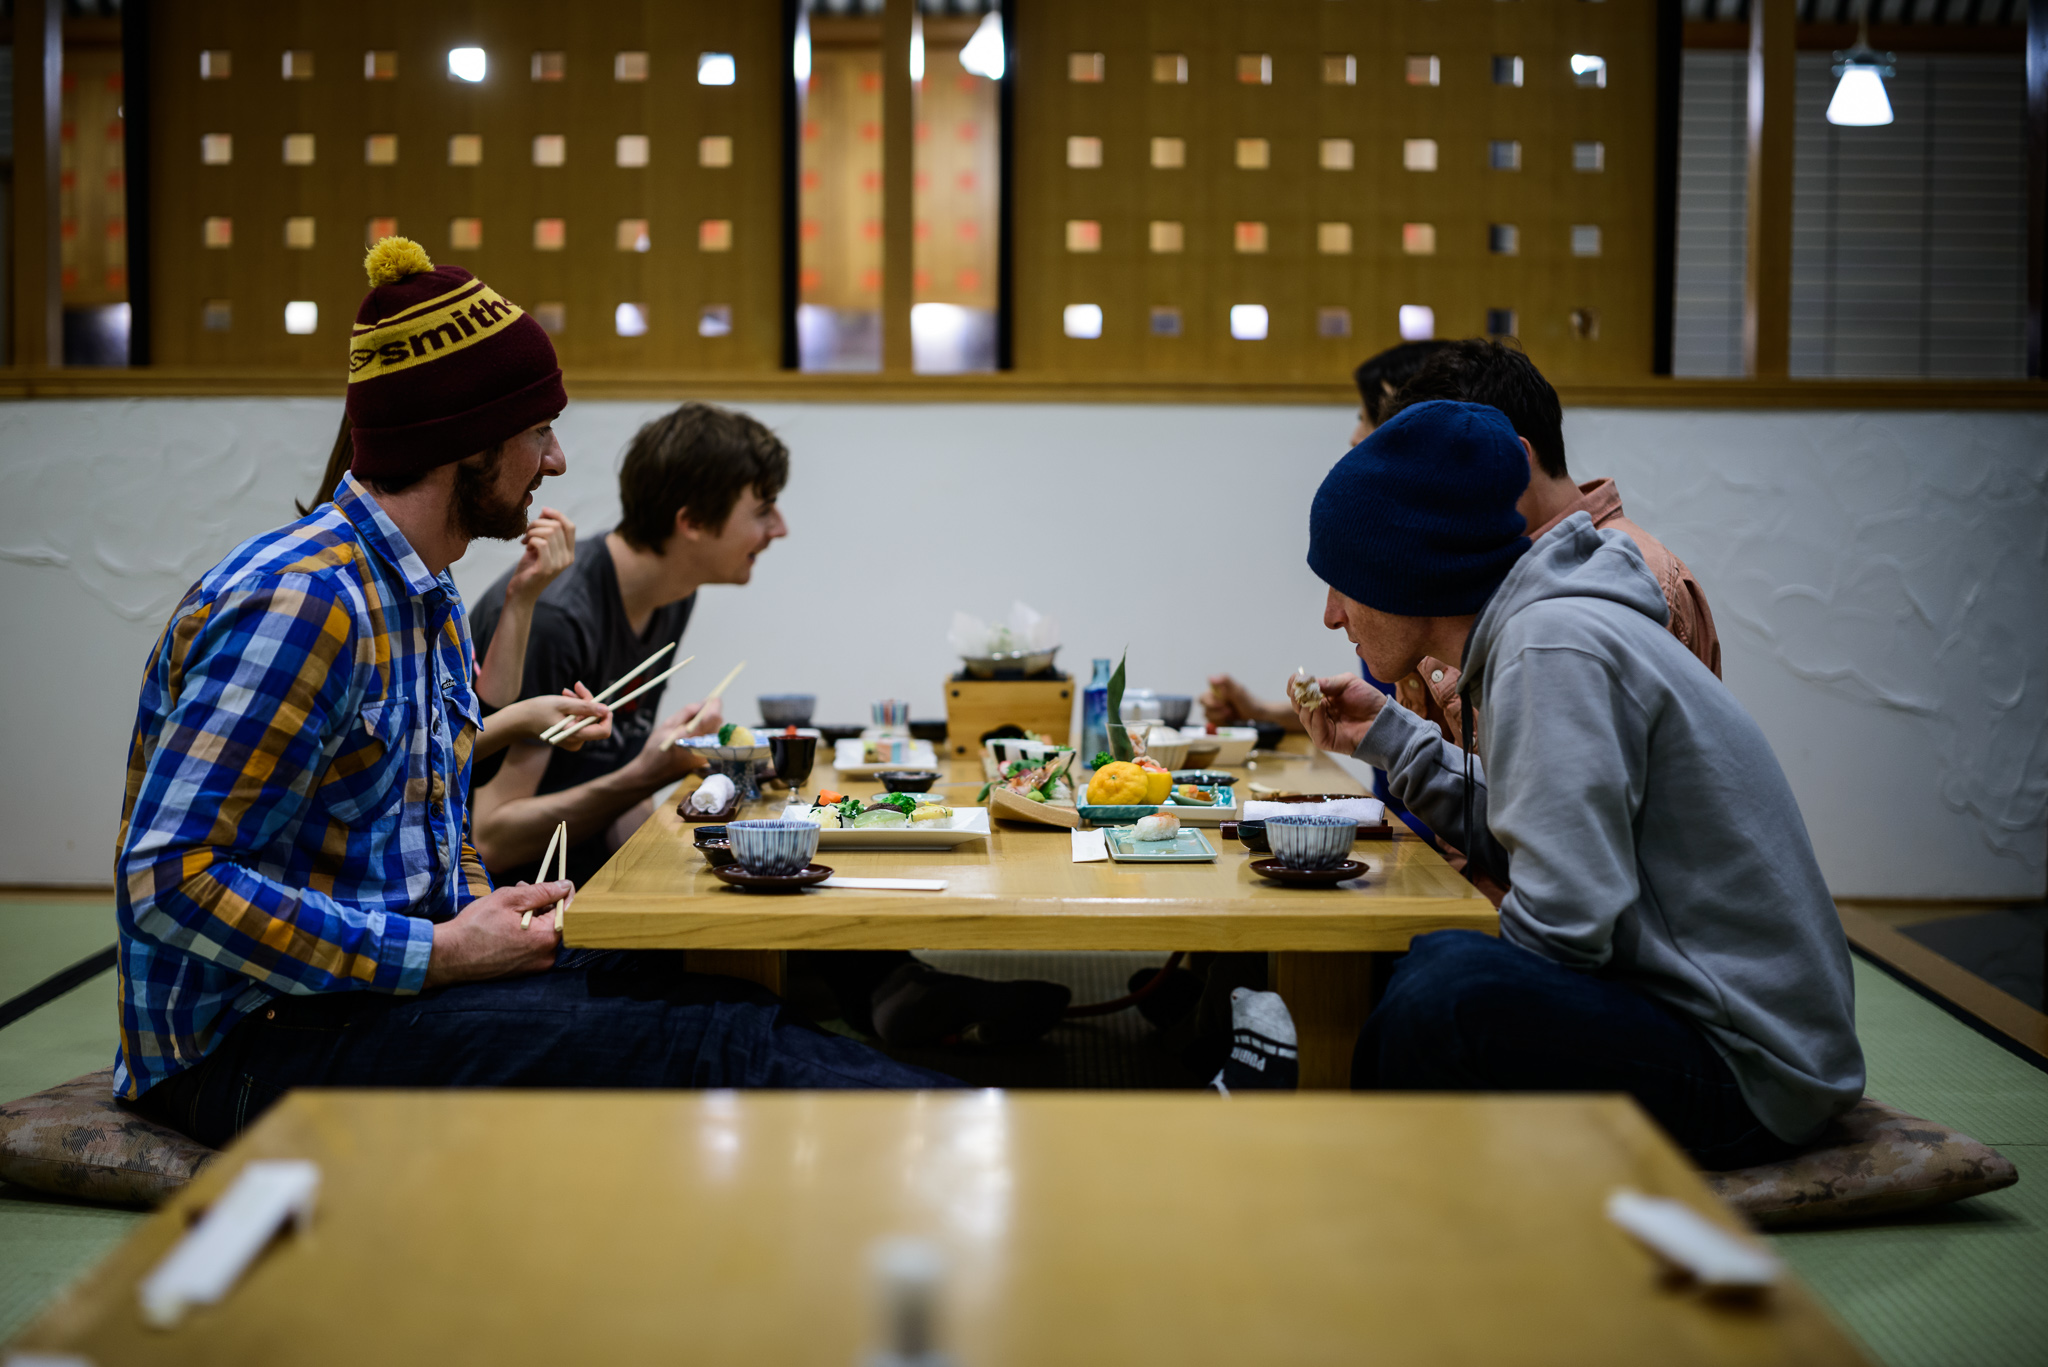 Snowlocals team sits down for a Japanese dinner at Rusutsu Ski Resort